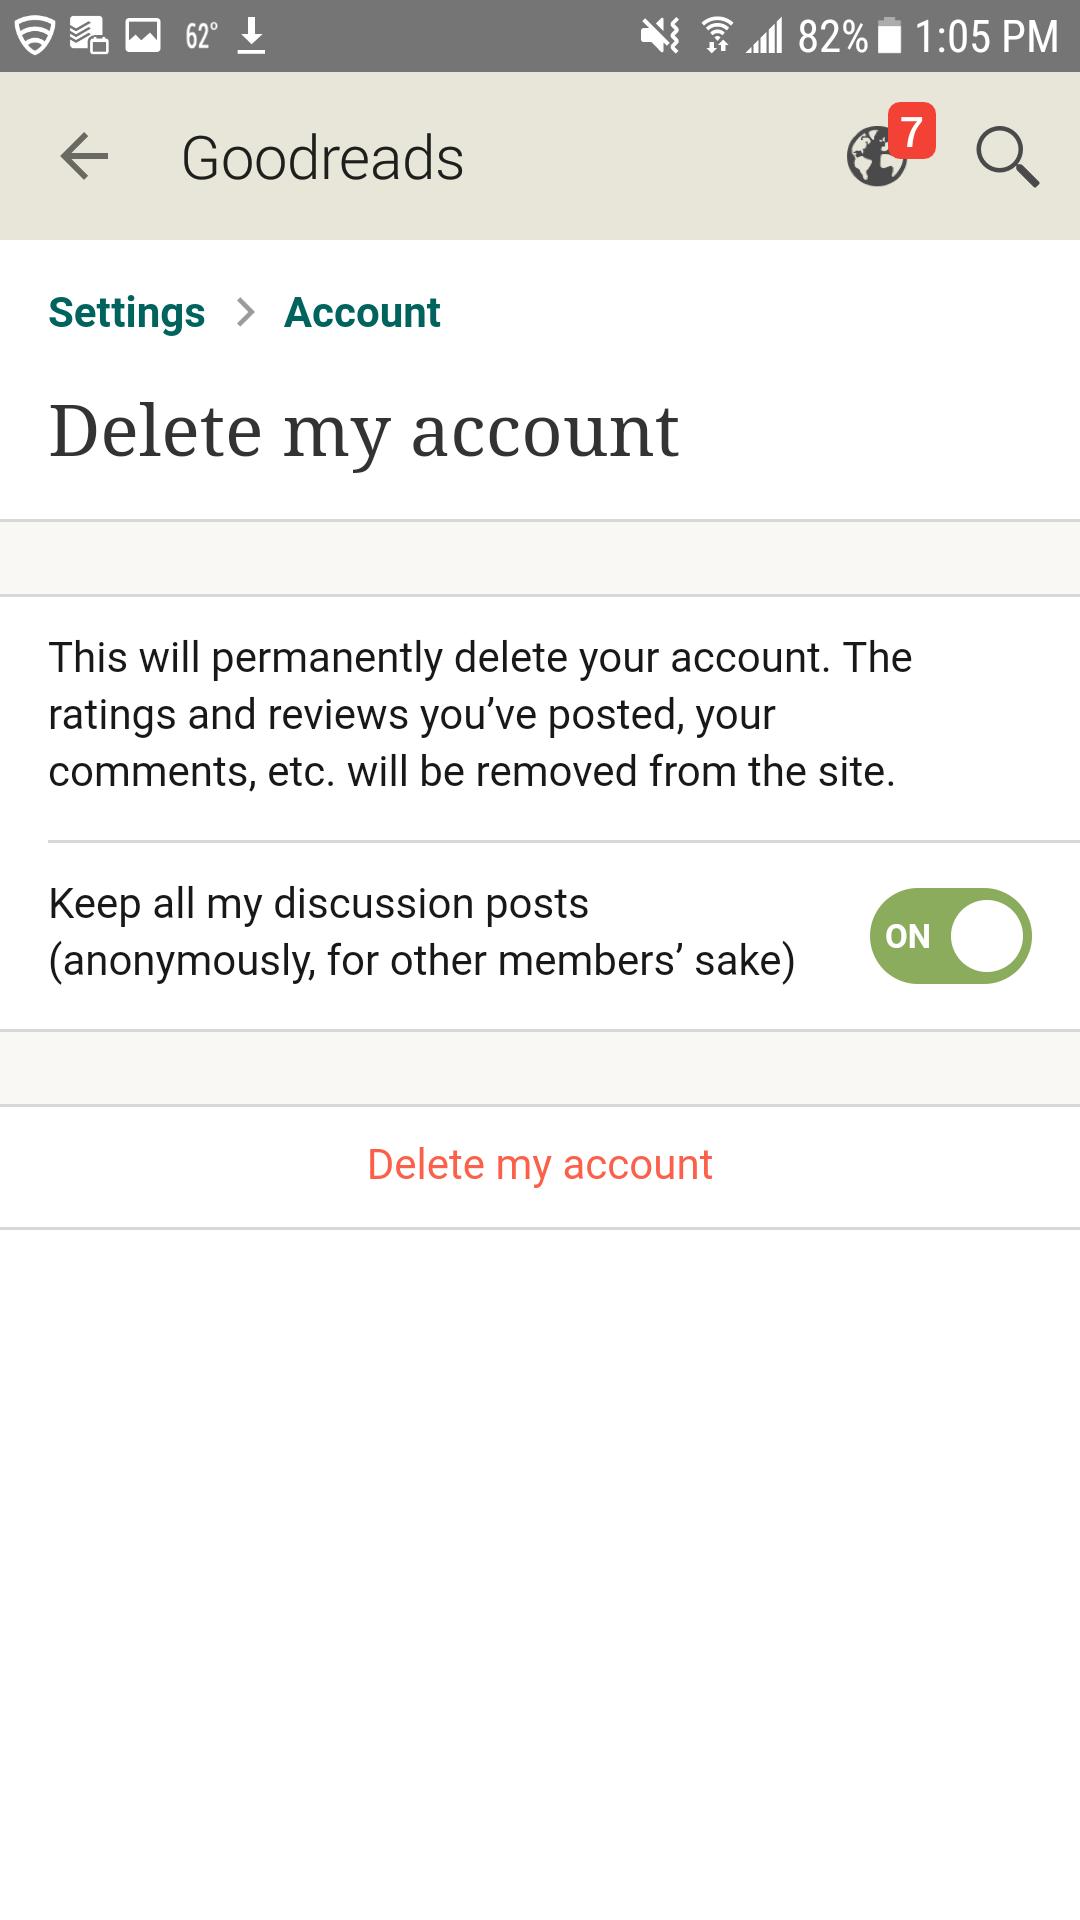 How do i delete my goodreads account